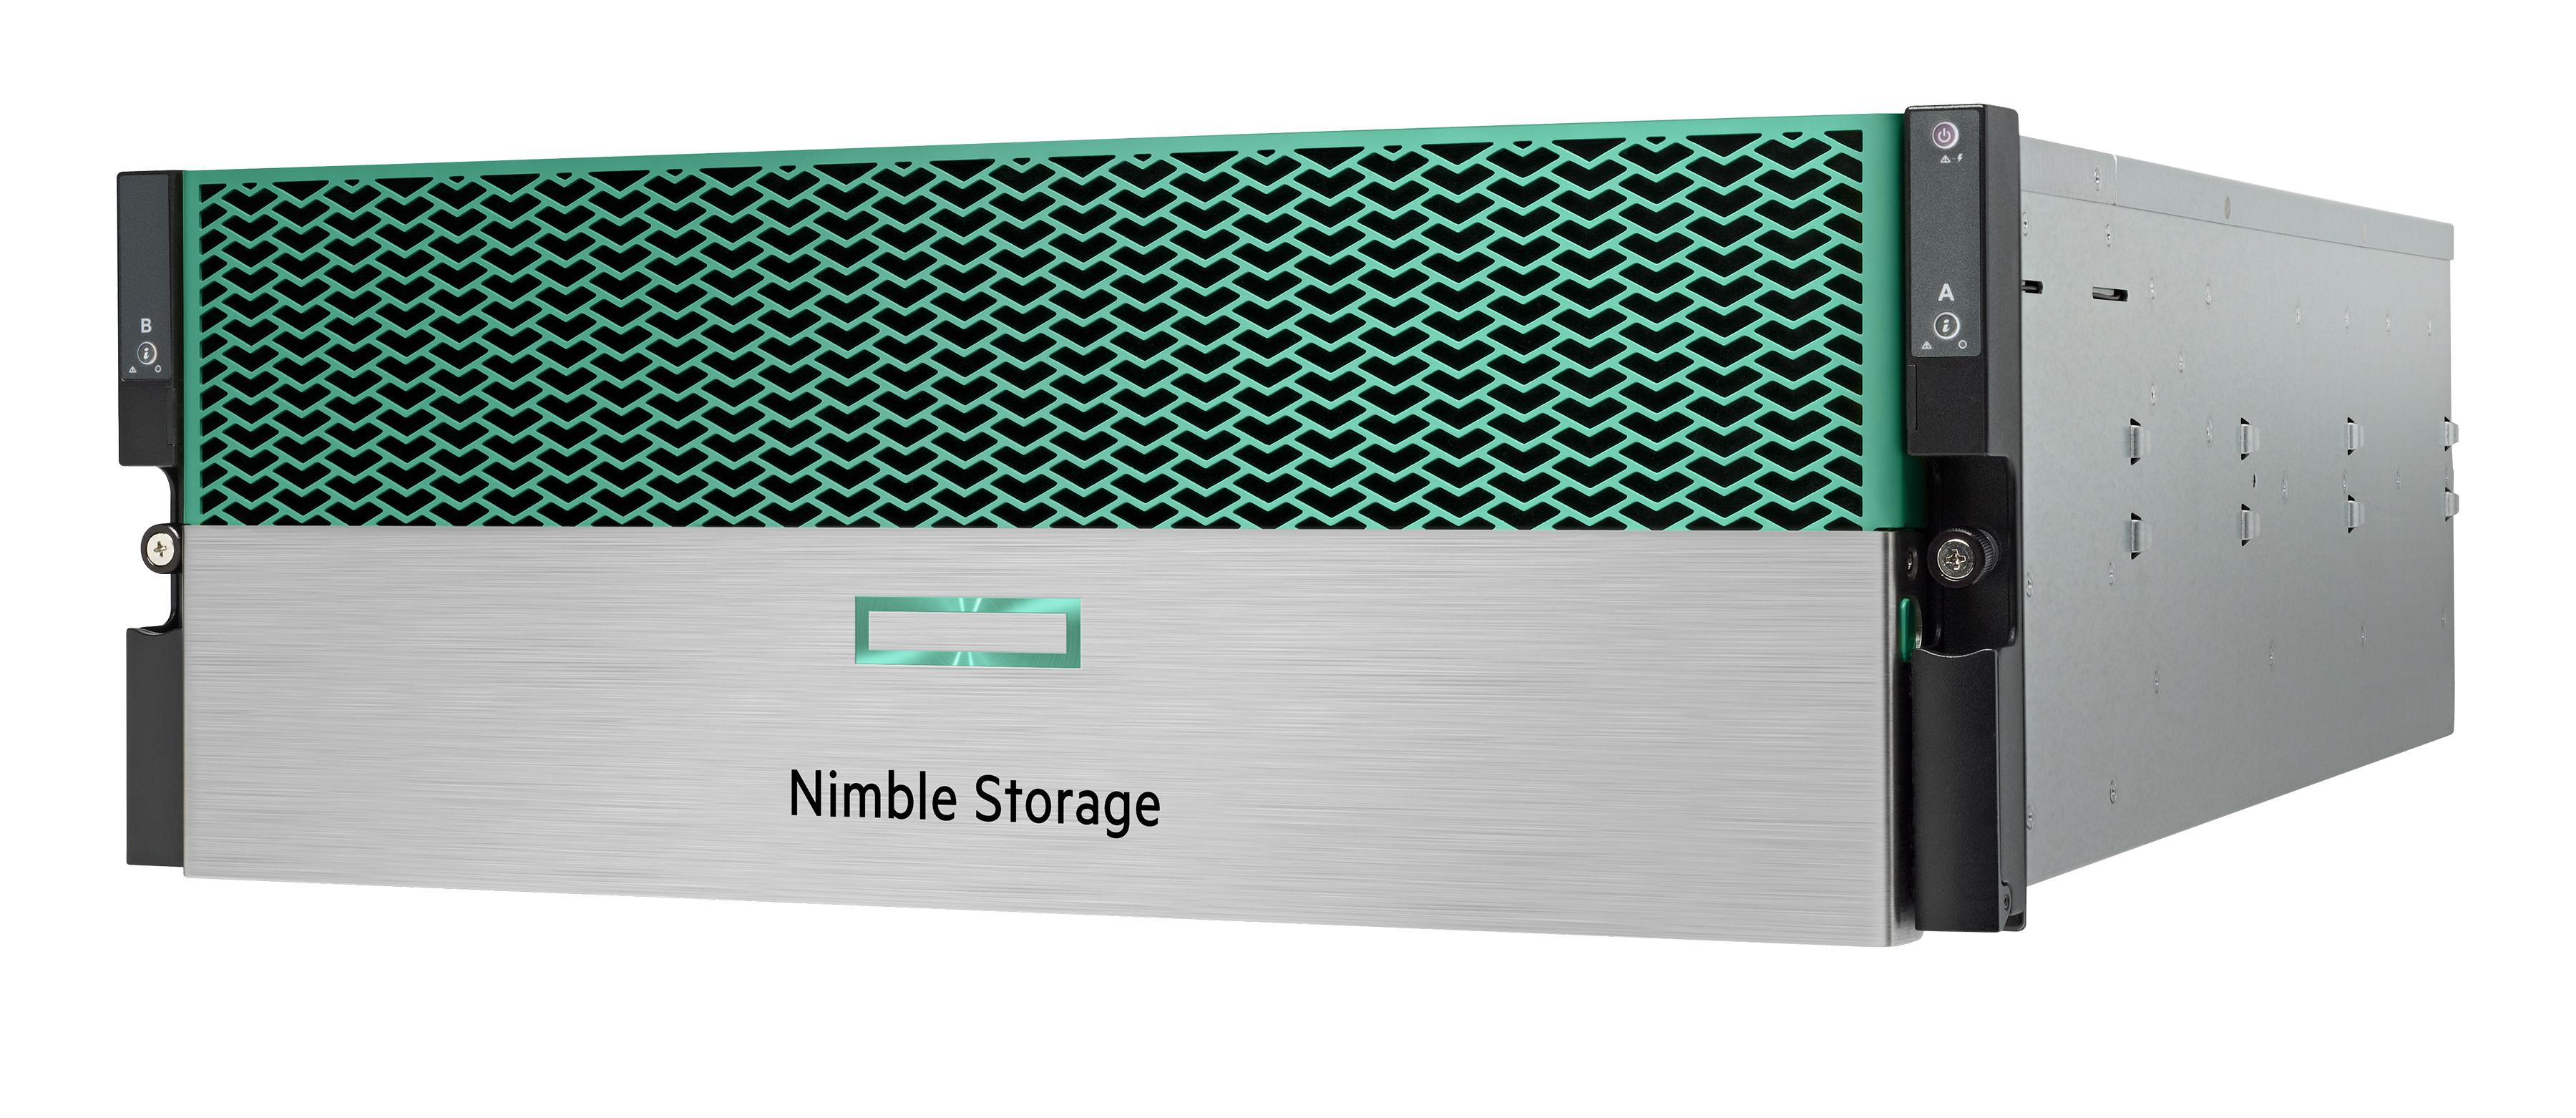 HPE Nimble Storage Adaptive Flash Arrays FL